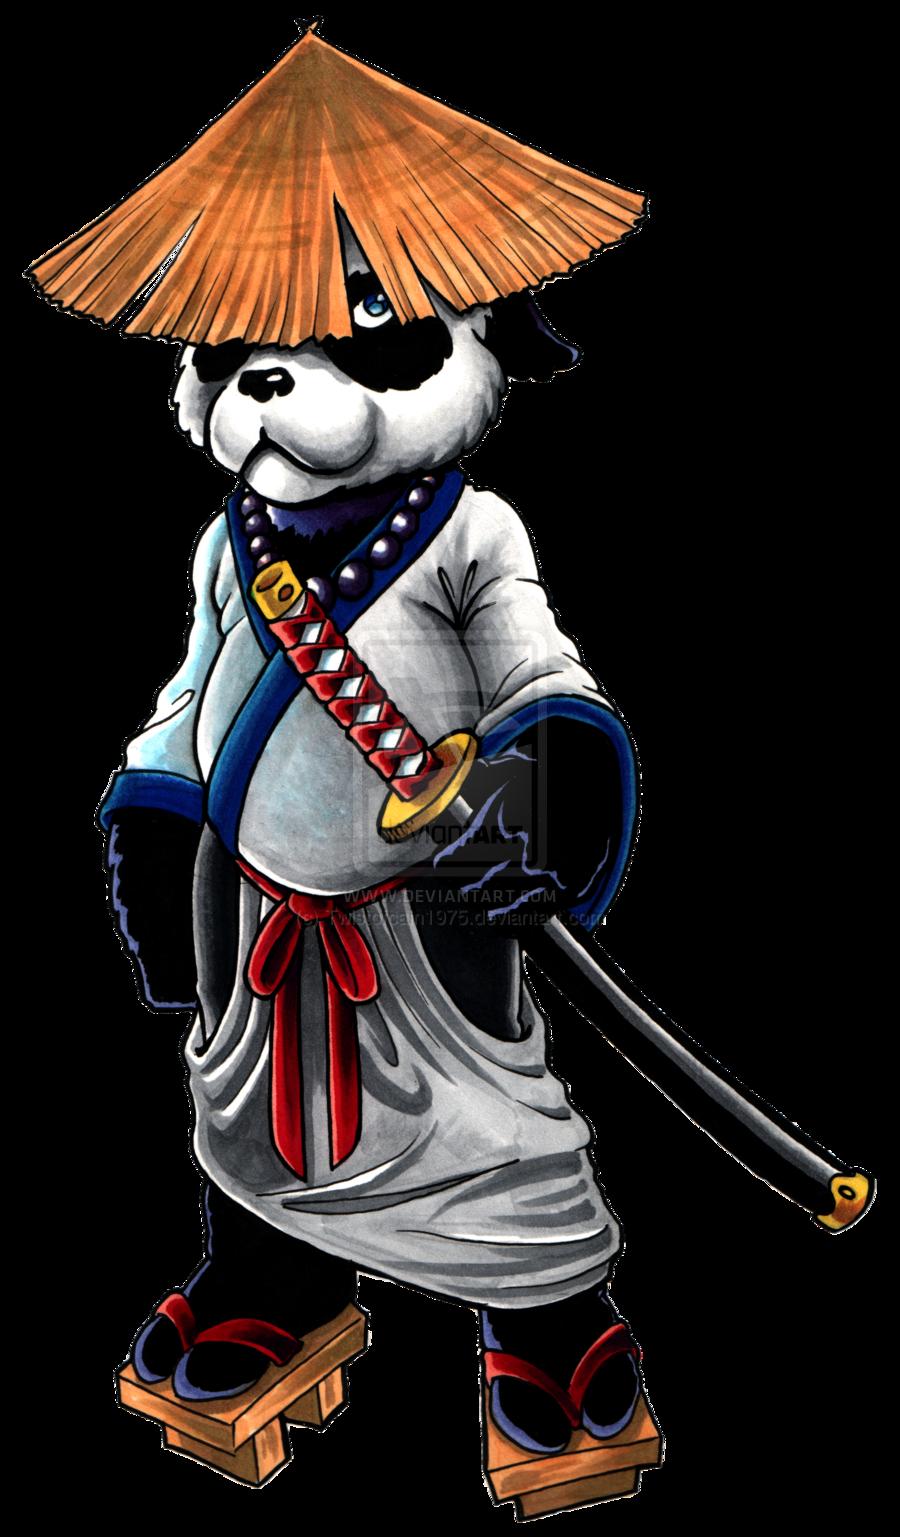 Ducks clipart duc. Samurai panda pandas pinterest